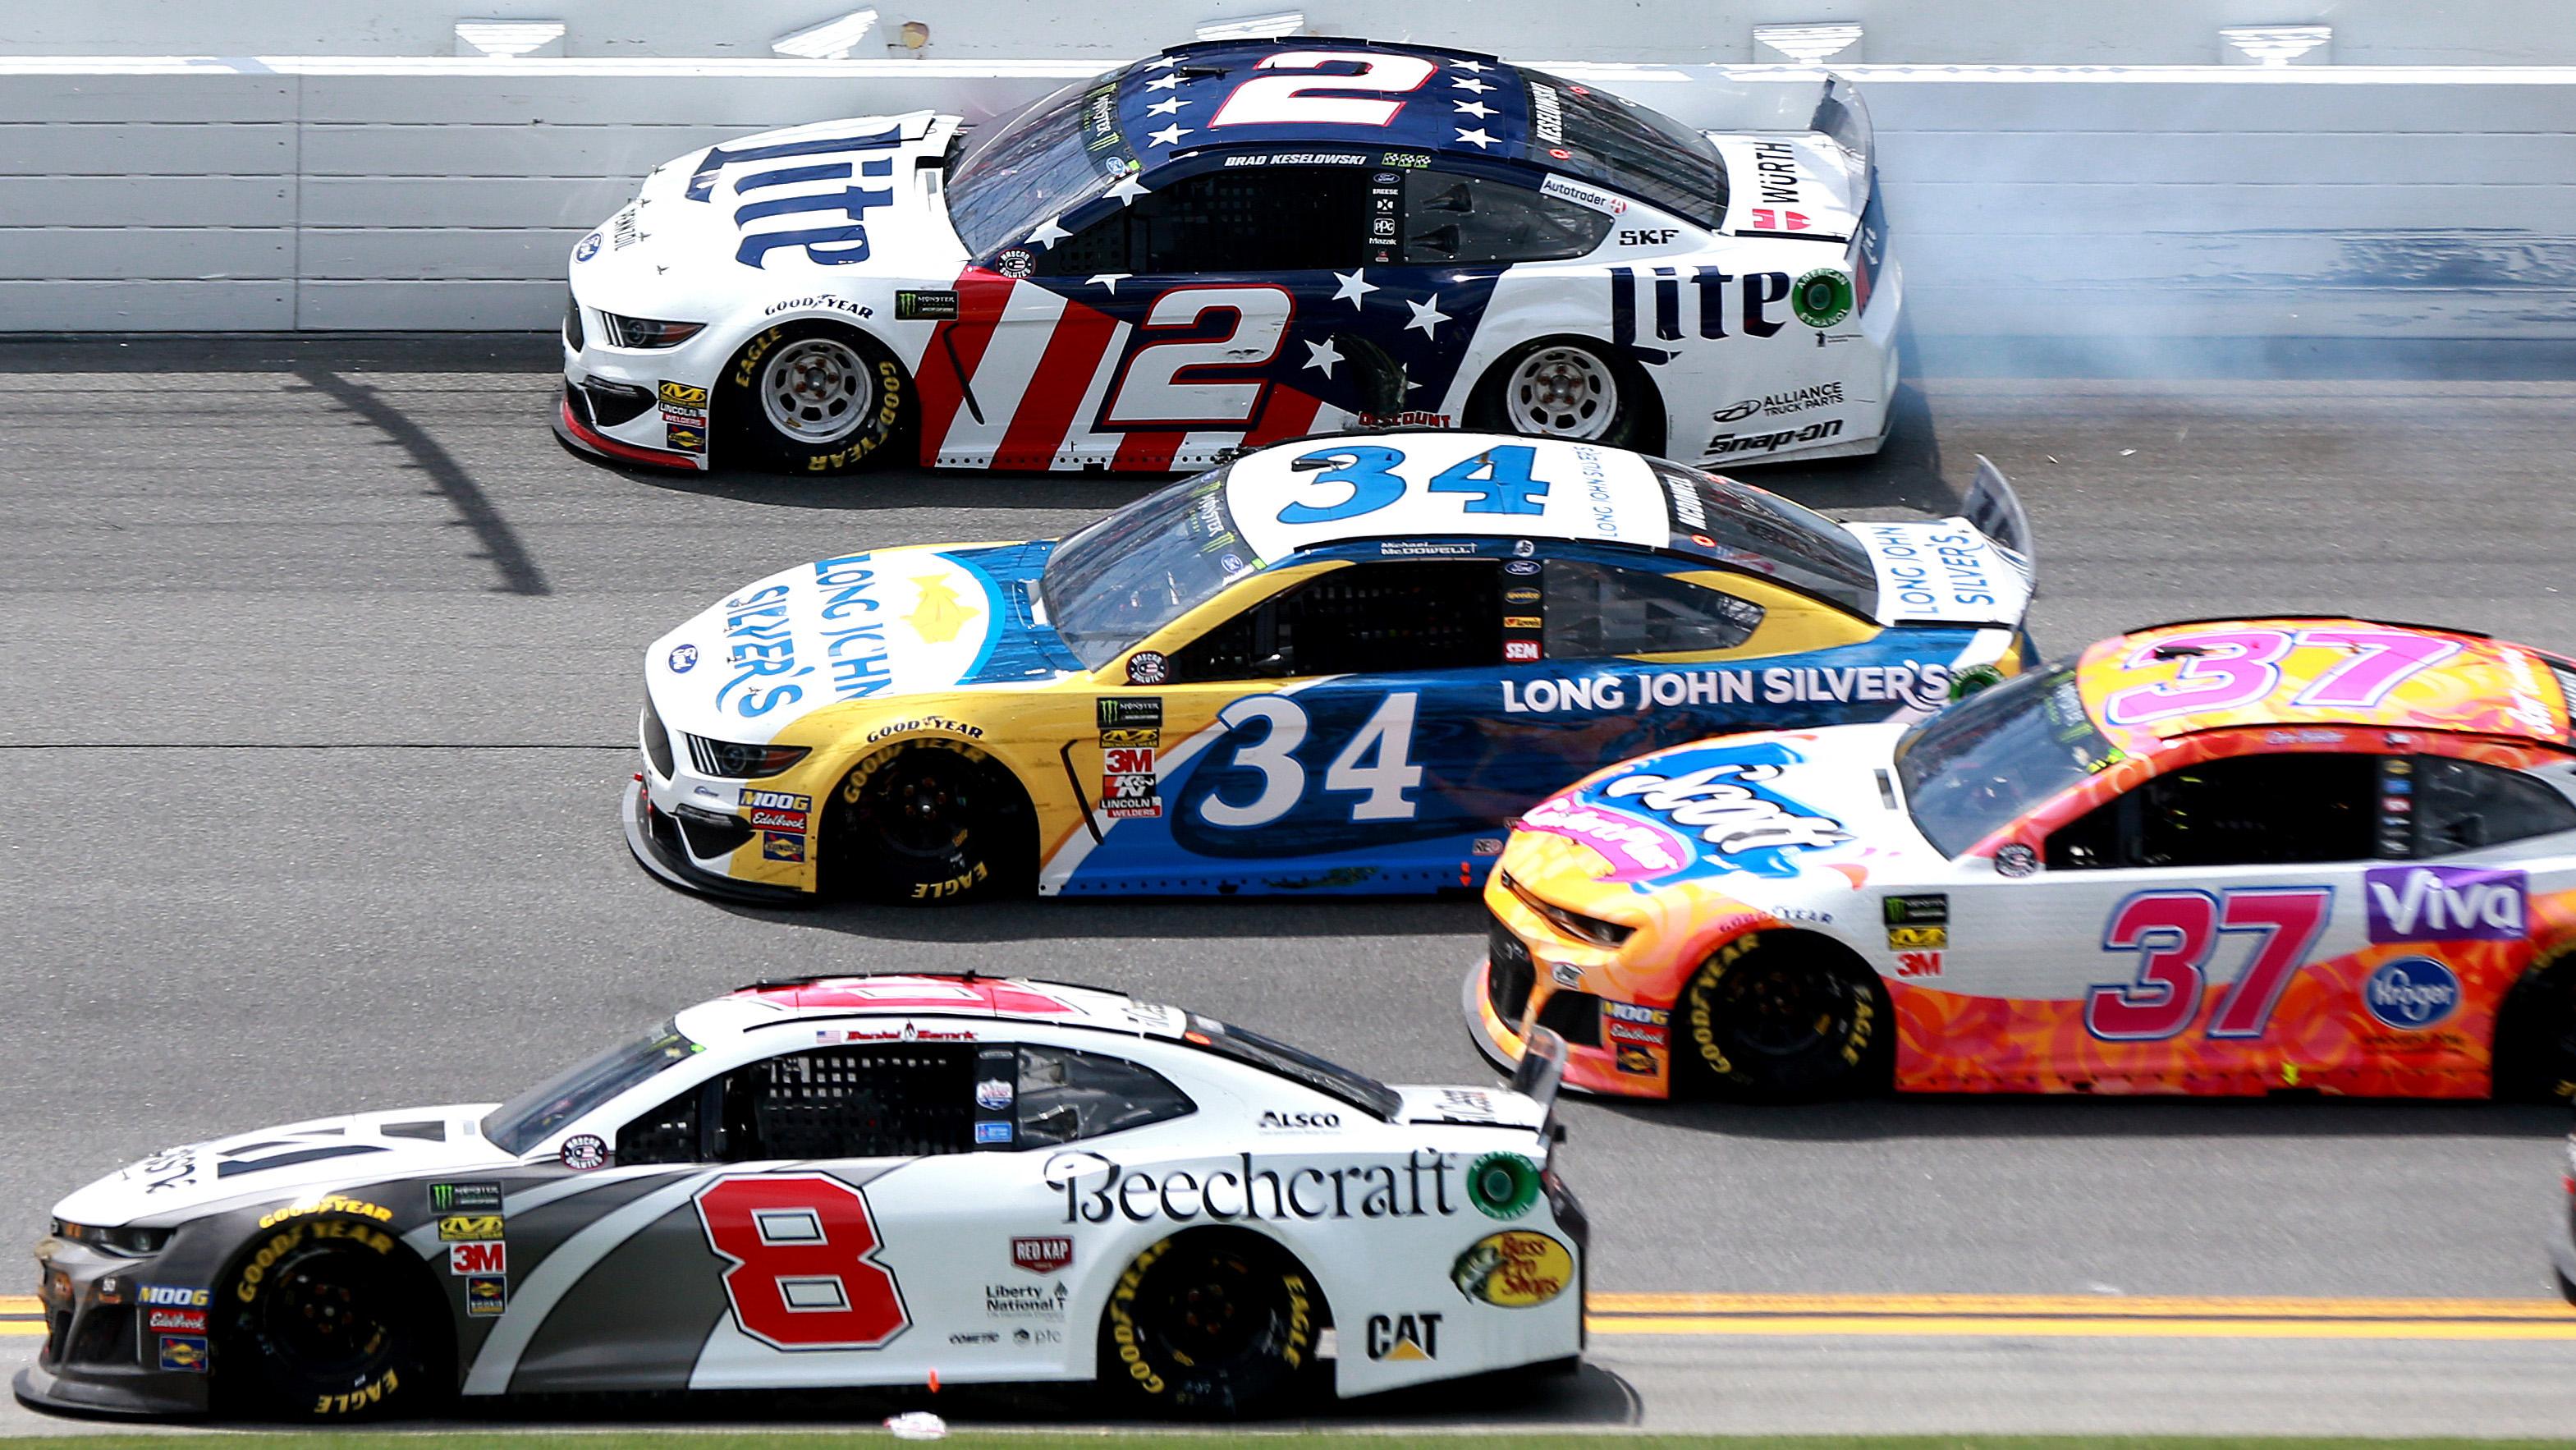 NASCAR: Brad Keselowski done at Daytona after wreck on lap 81